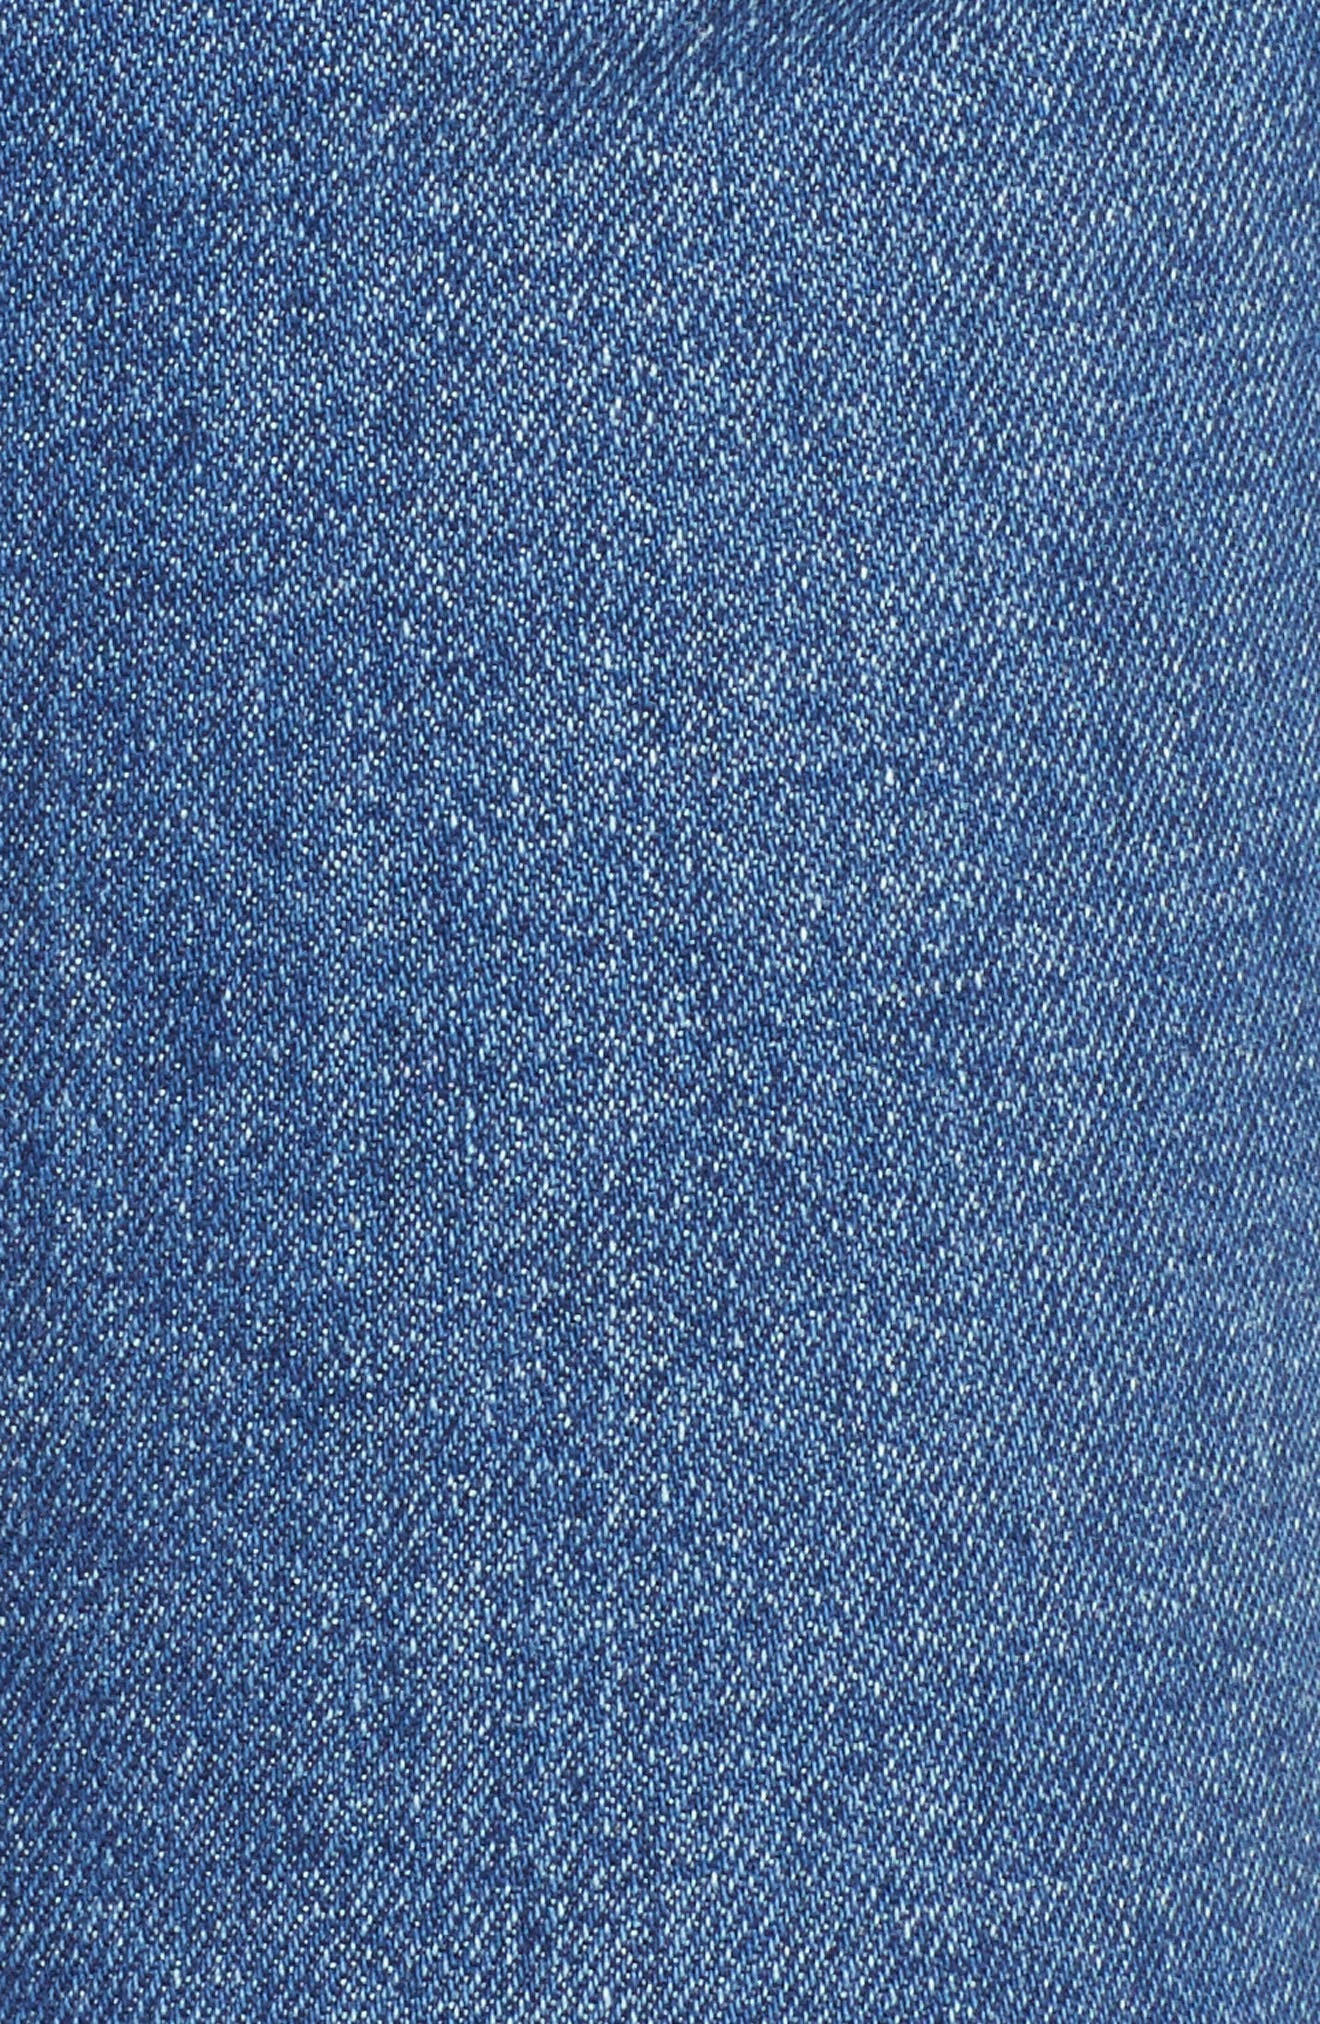 Izzy High Waist Slim Crop Jeans,                             Alternate thumbnail 6, color,                             400